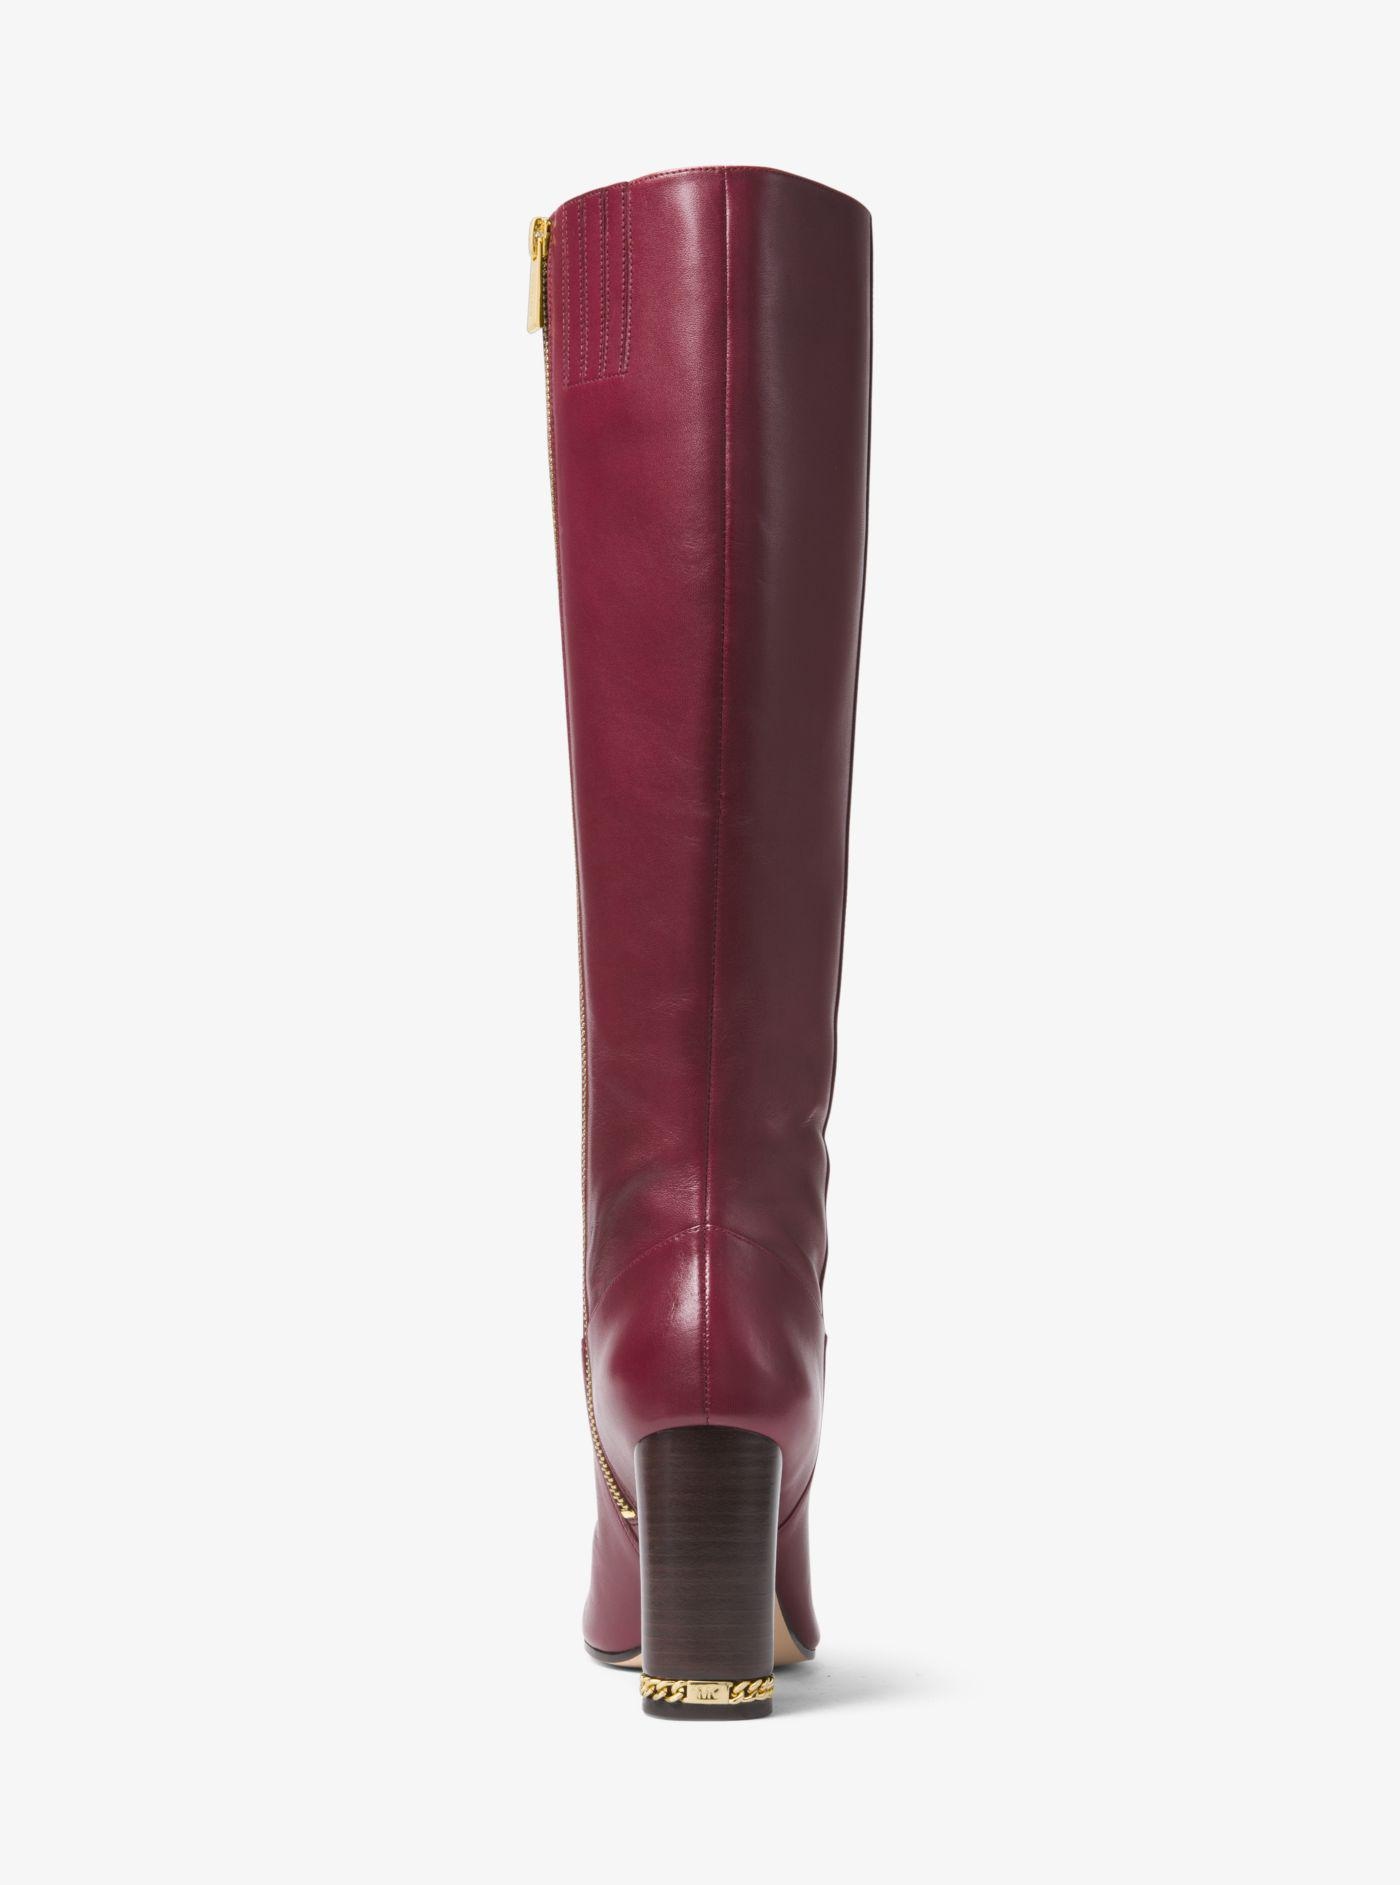 Michael Kors Walker Leather Boot in